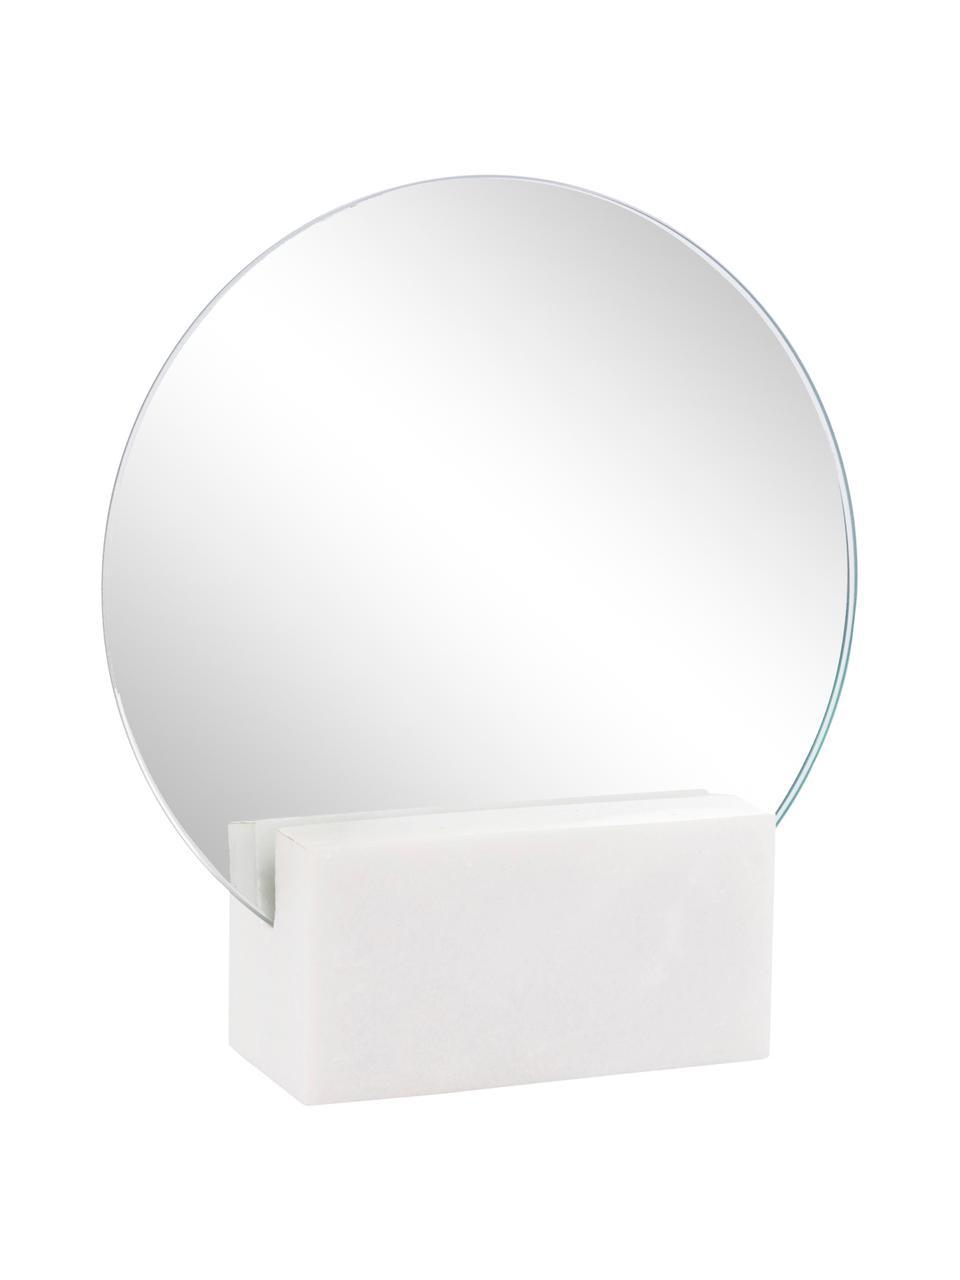 Kosmetické zrcadlo Humana, Bílá